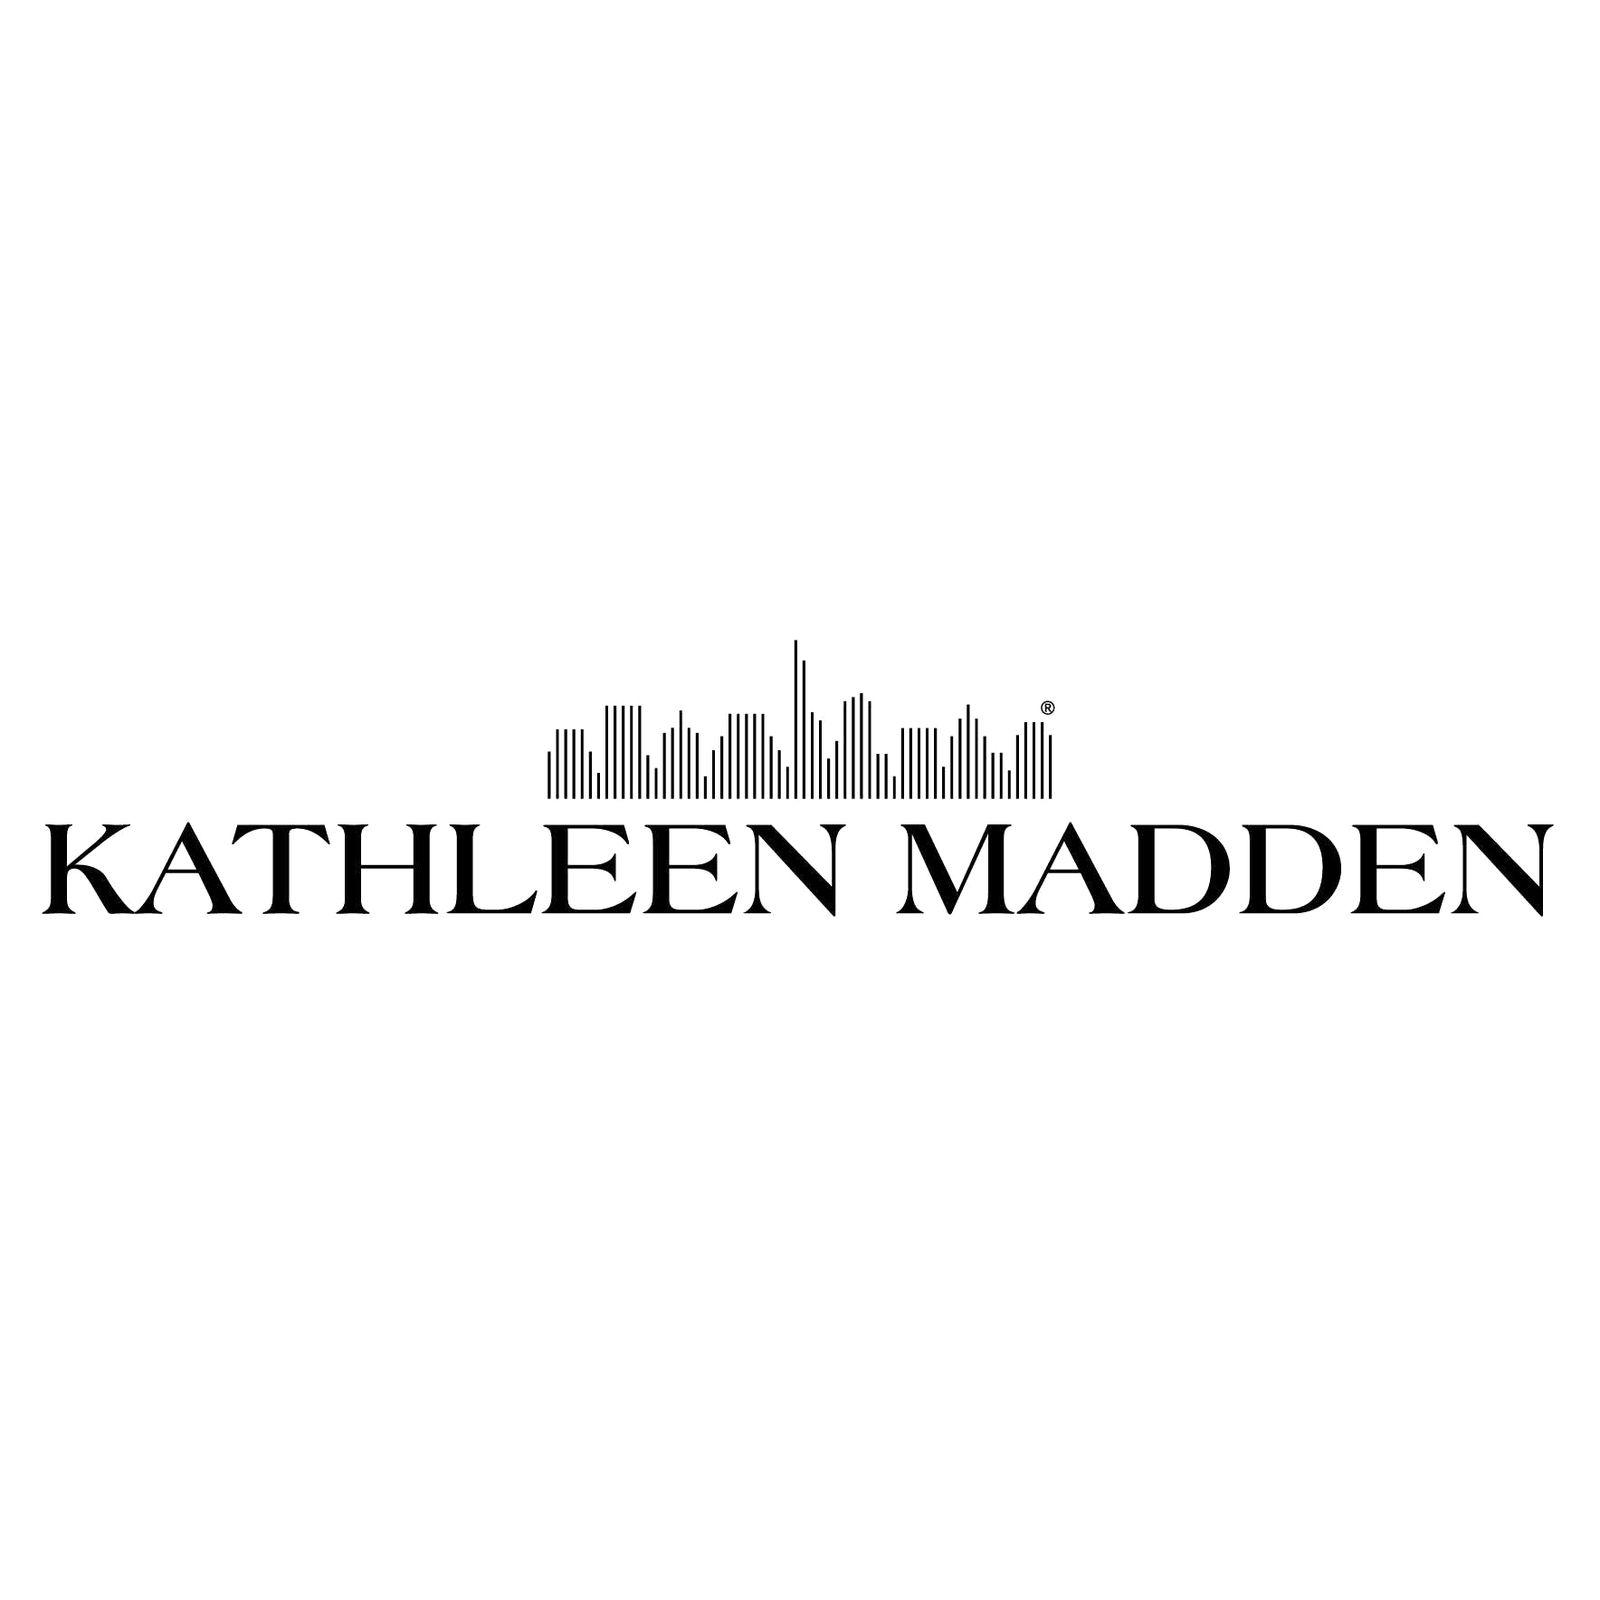 KATHLEEN MADDEN